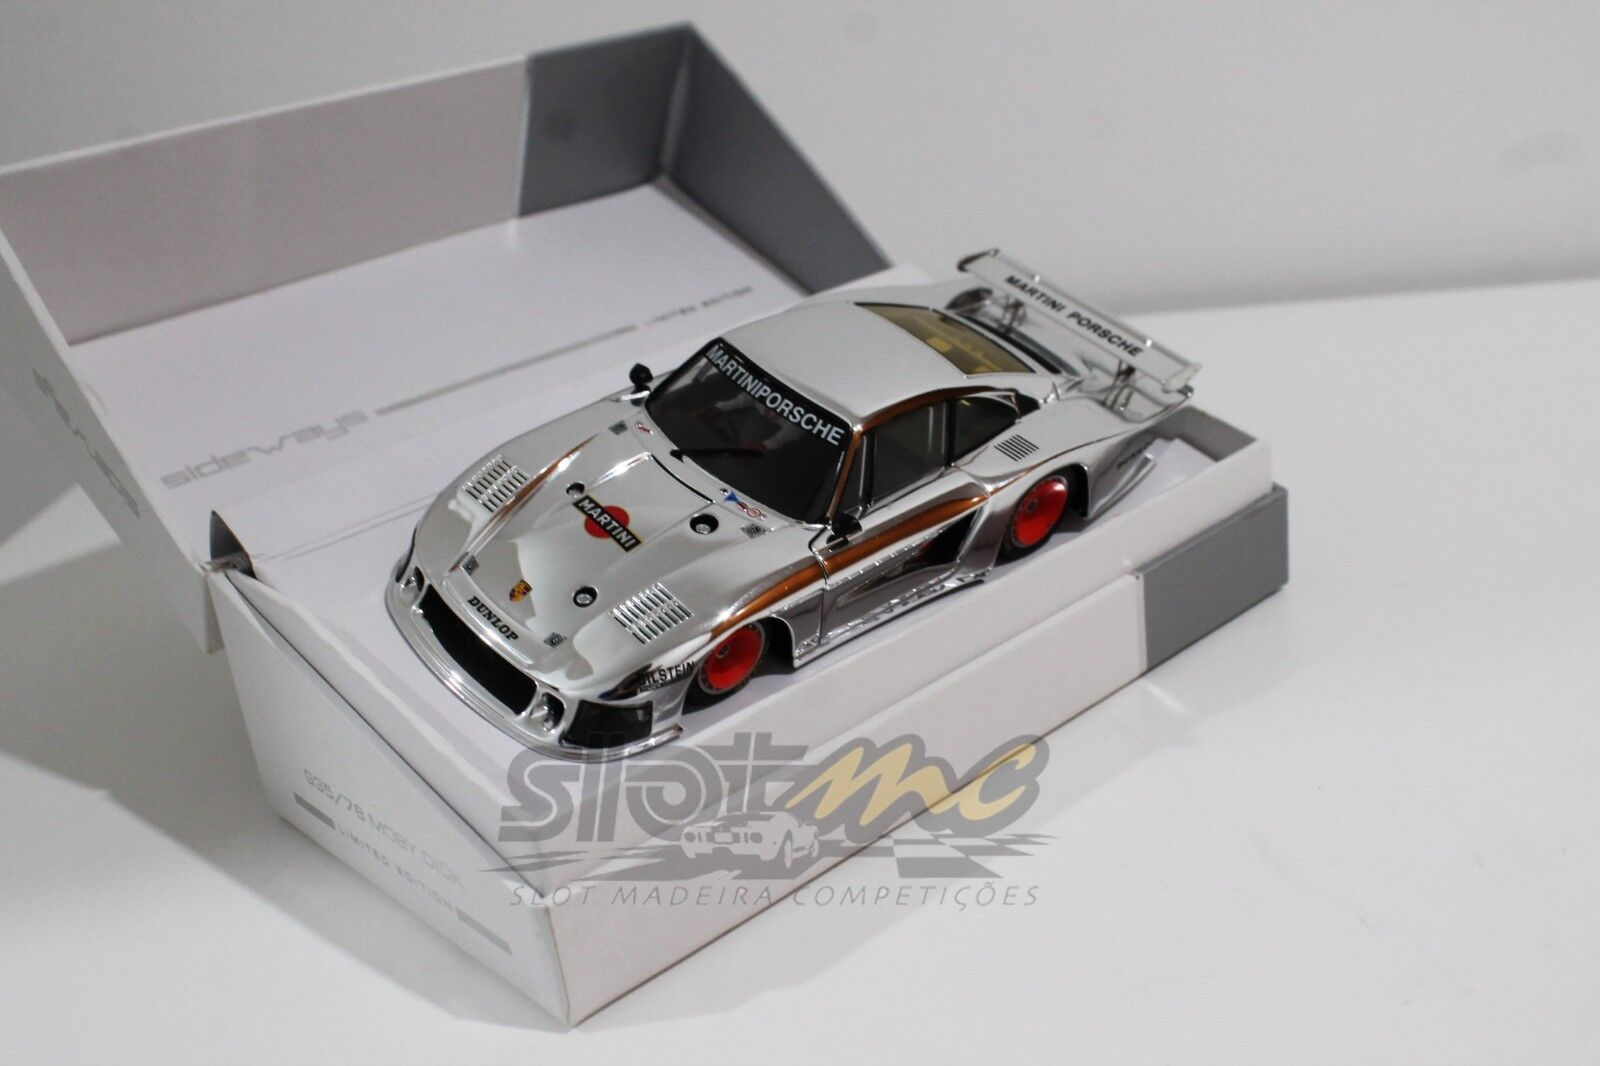 Audi originales s s1 s2 s3 s4 s5 s6 s7 s8 cuero aceptais 3181400210-nuevo